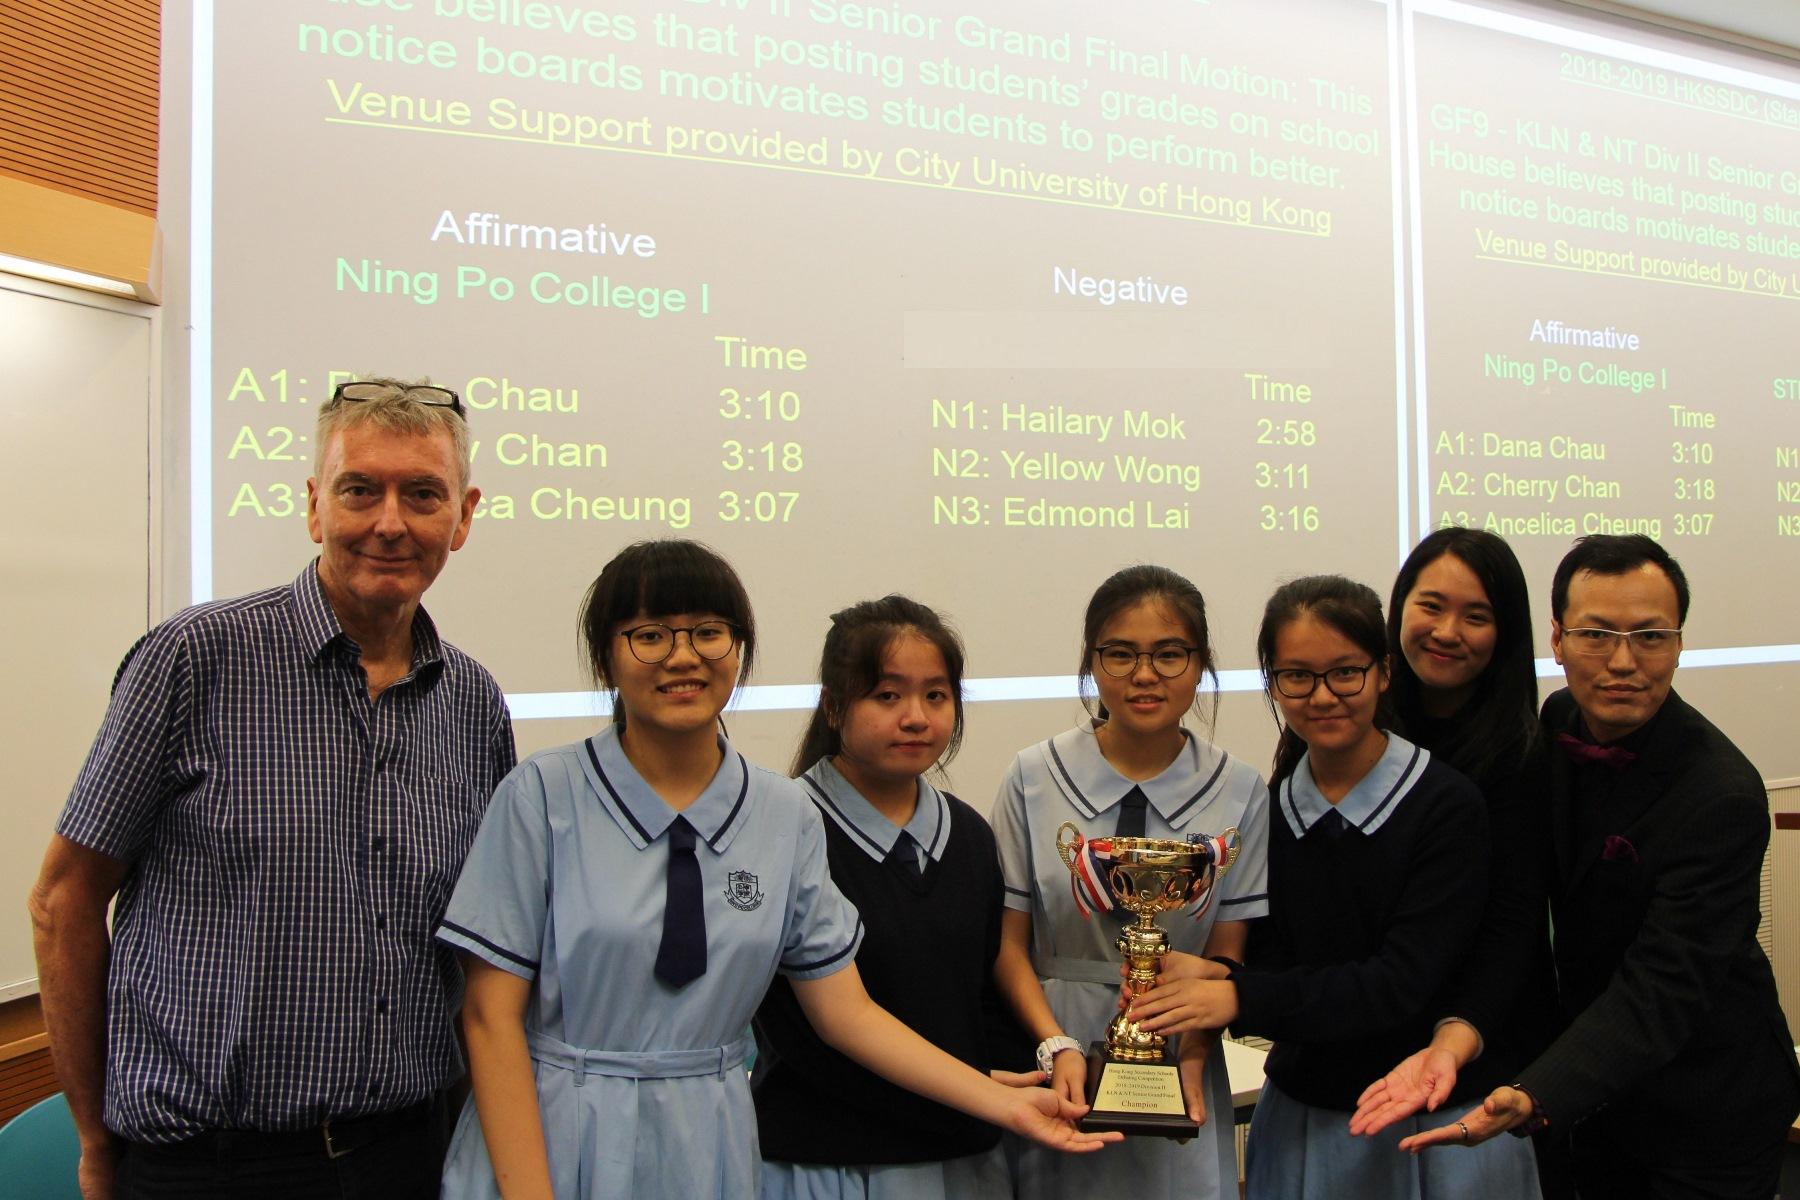 http://npc.edu.hk/sites/default/files/1_group_senior_edited.jpg